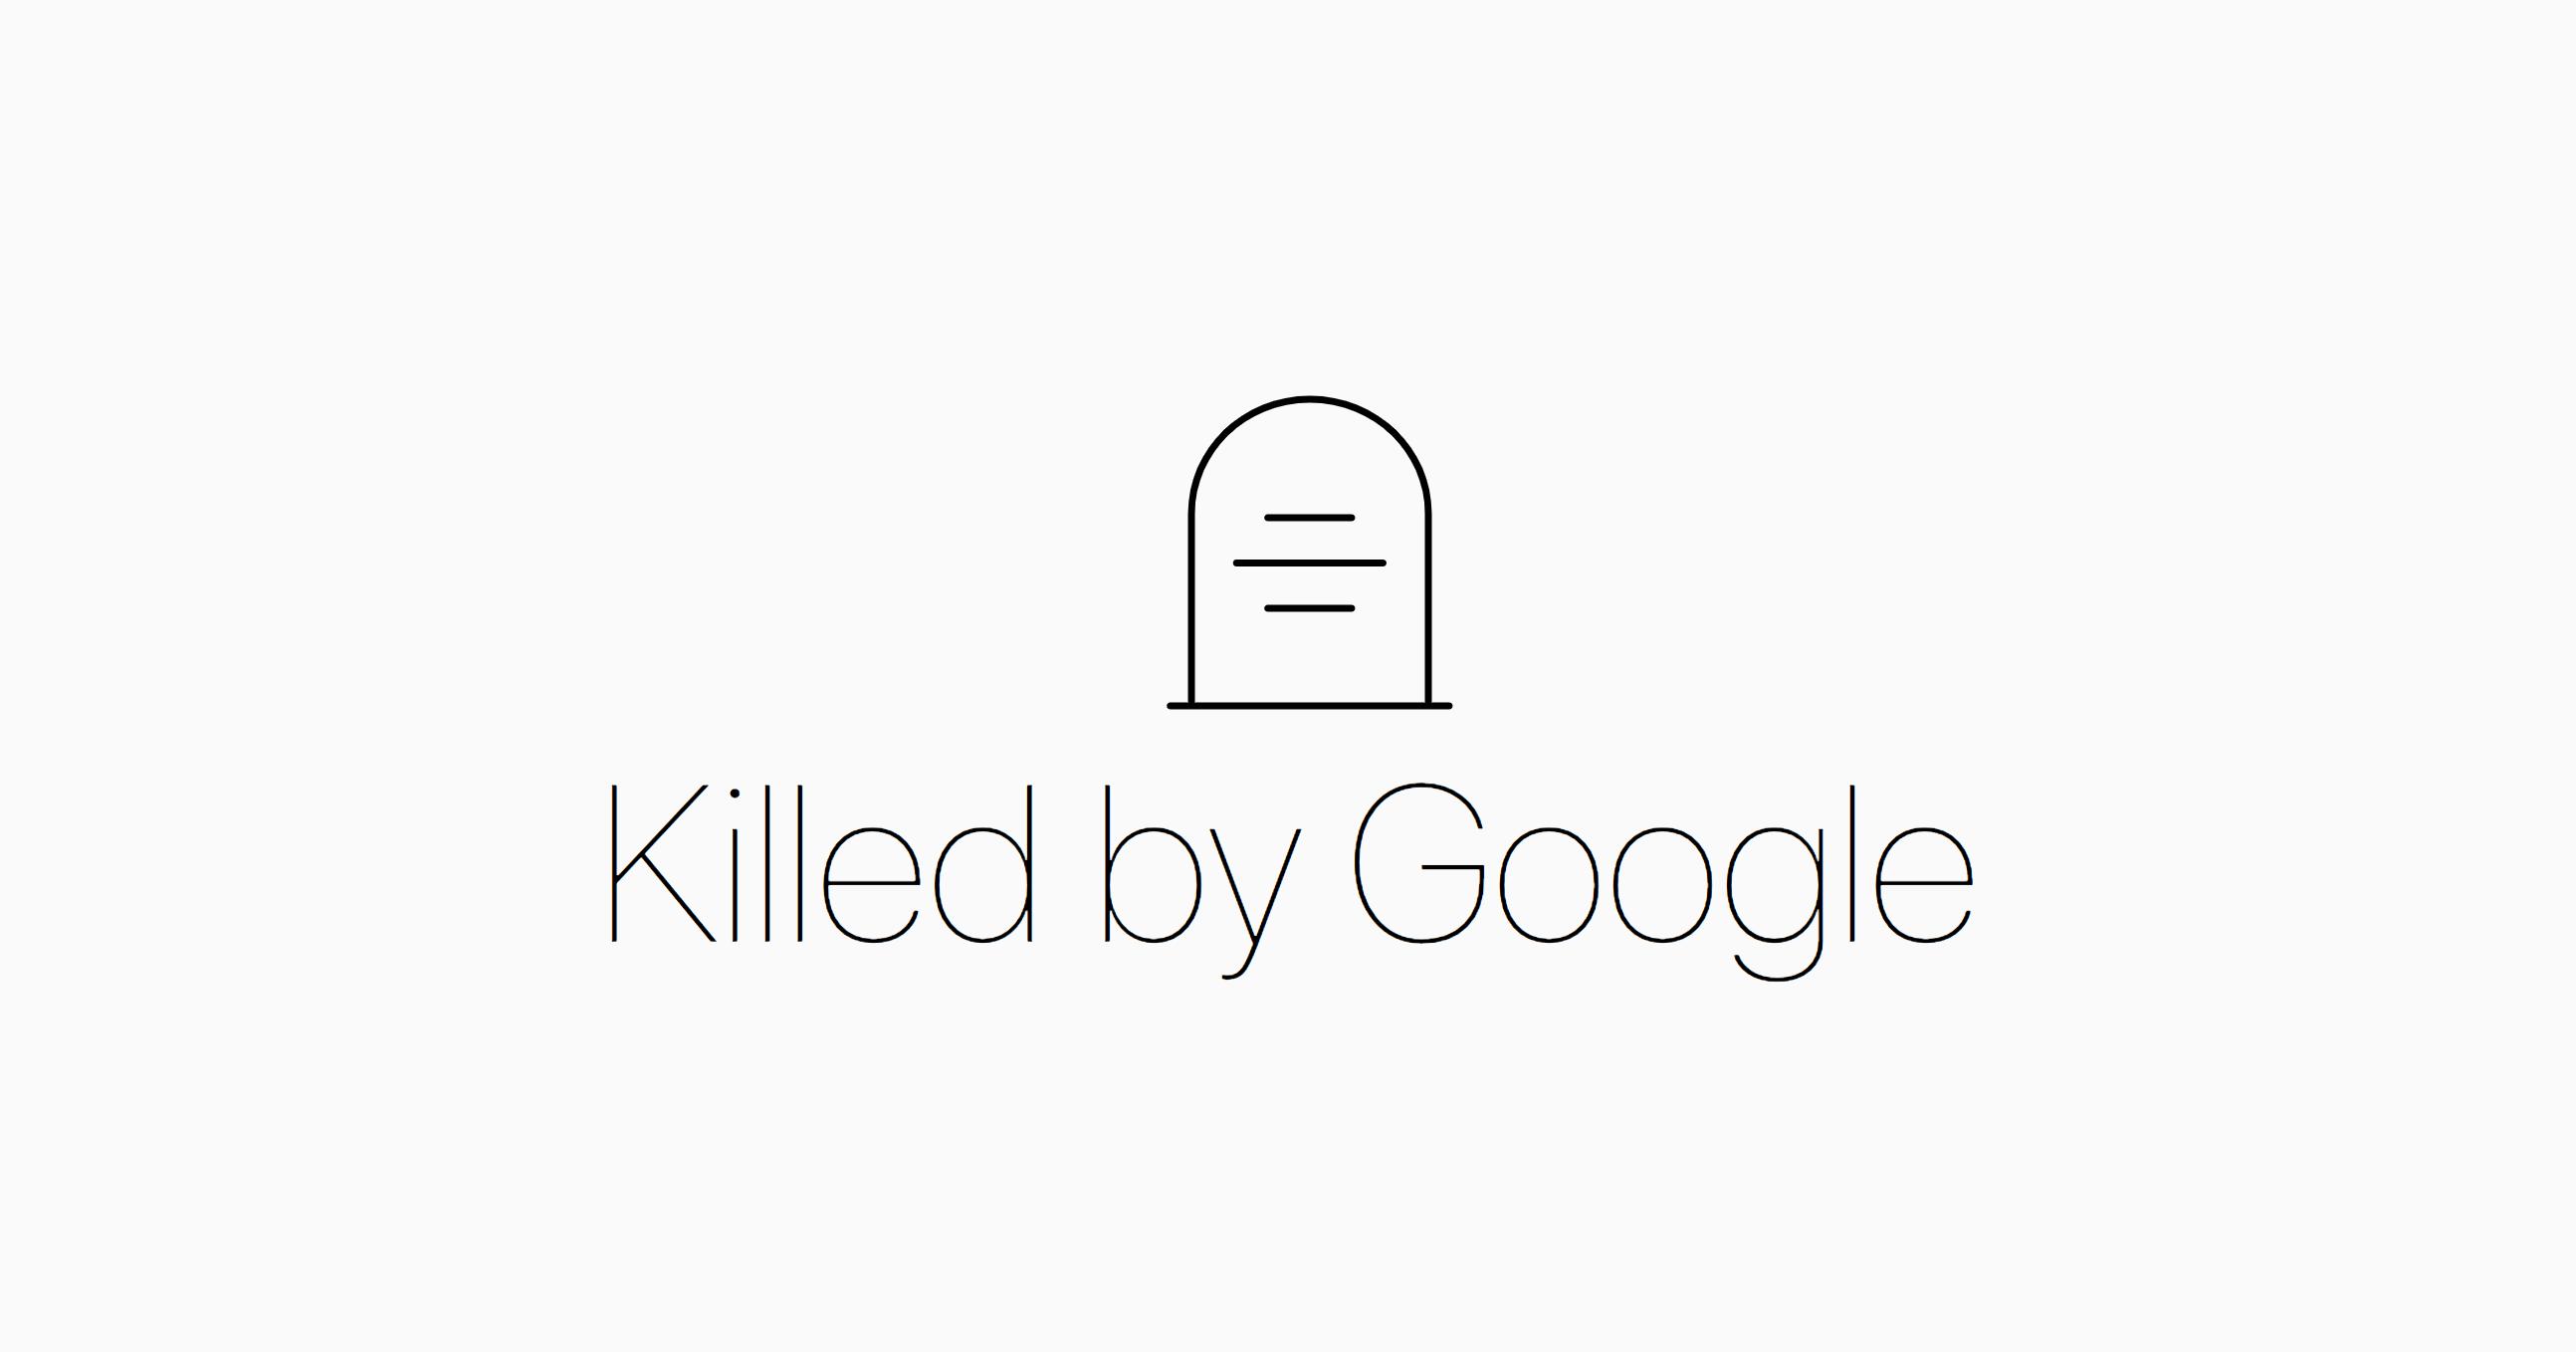 killedbygoogle.com